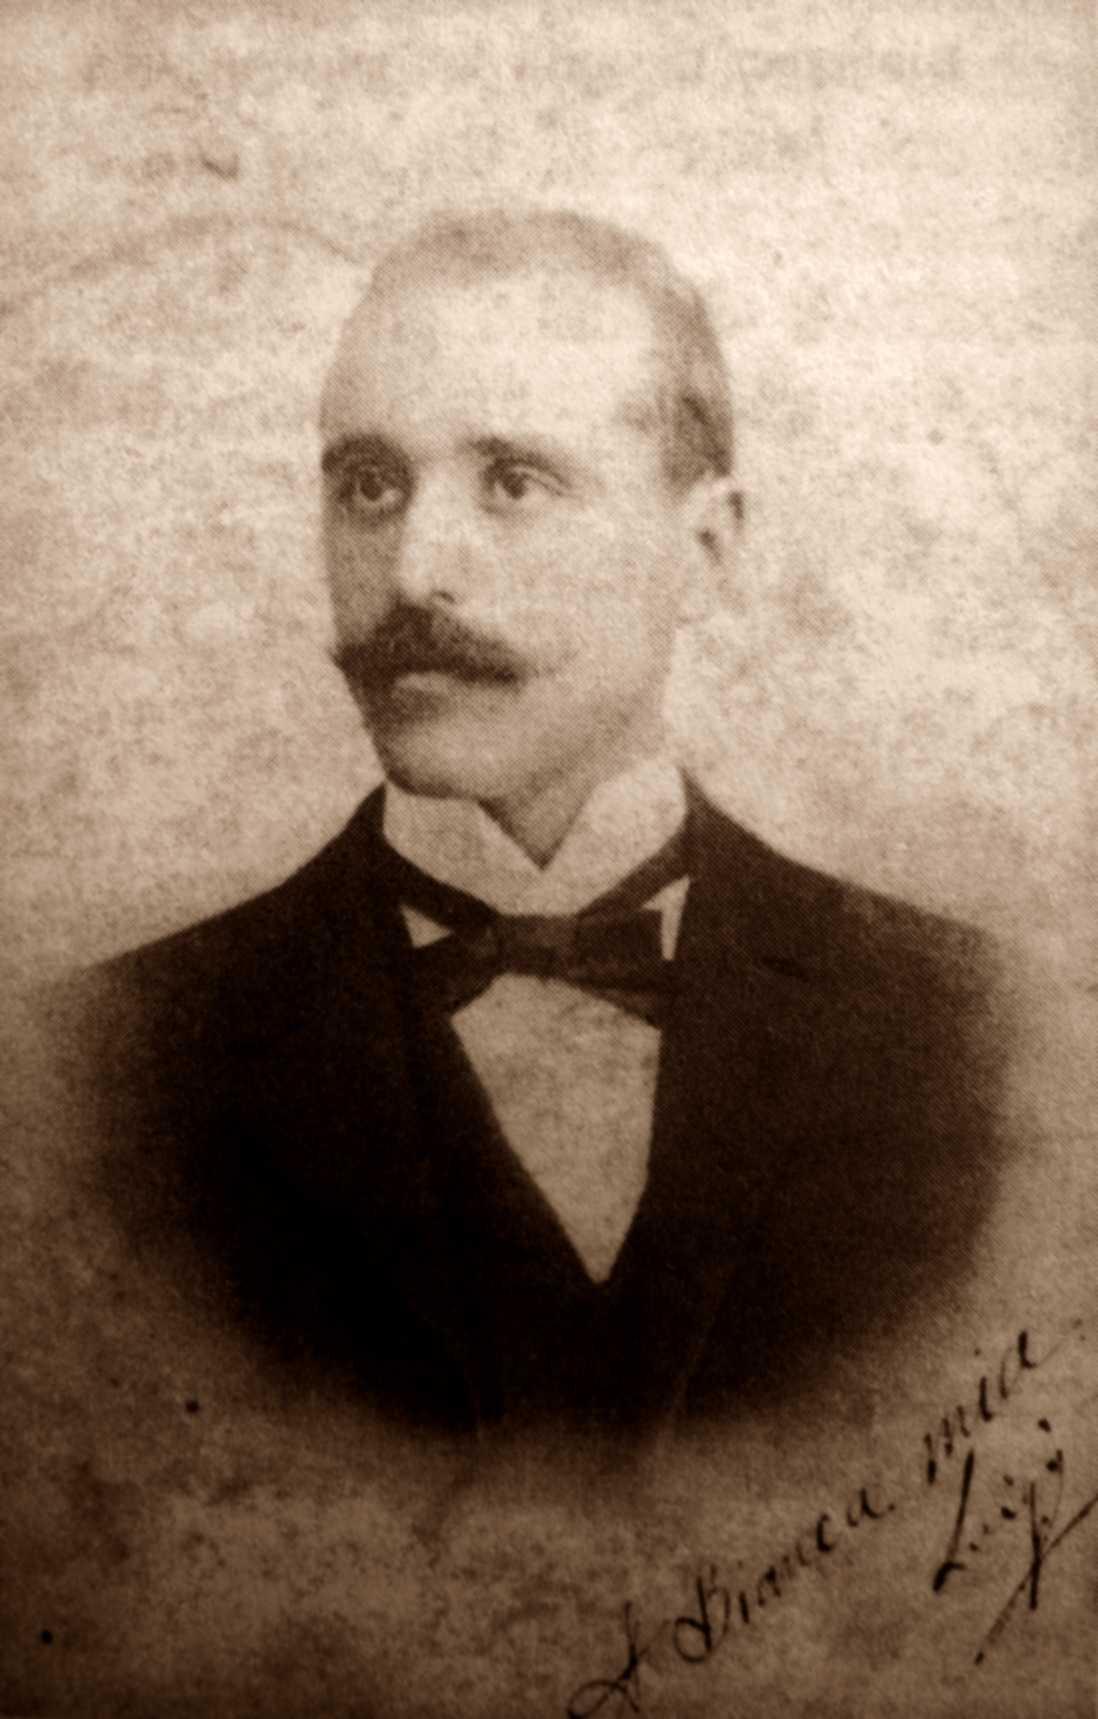 Luigi Fabbri fotografiat per Coniugi Canè